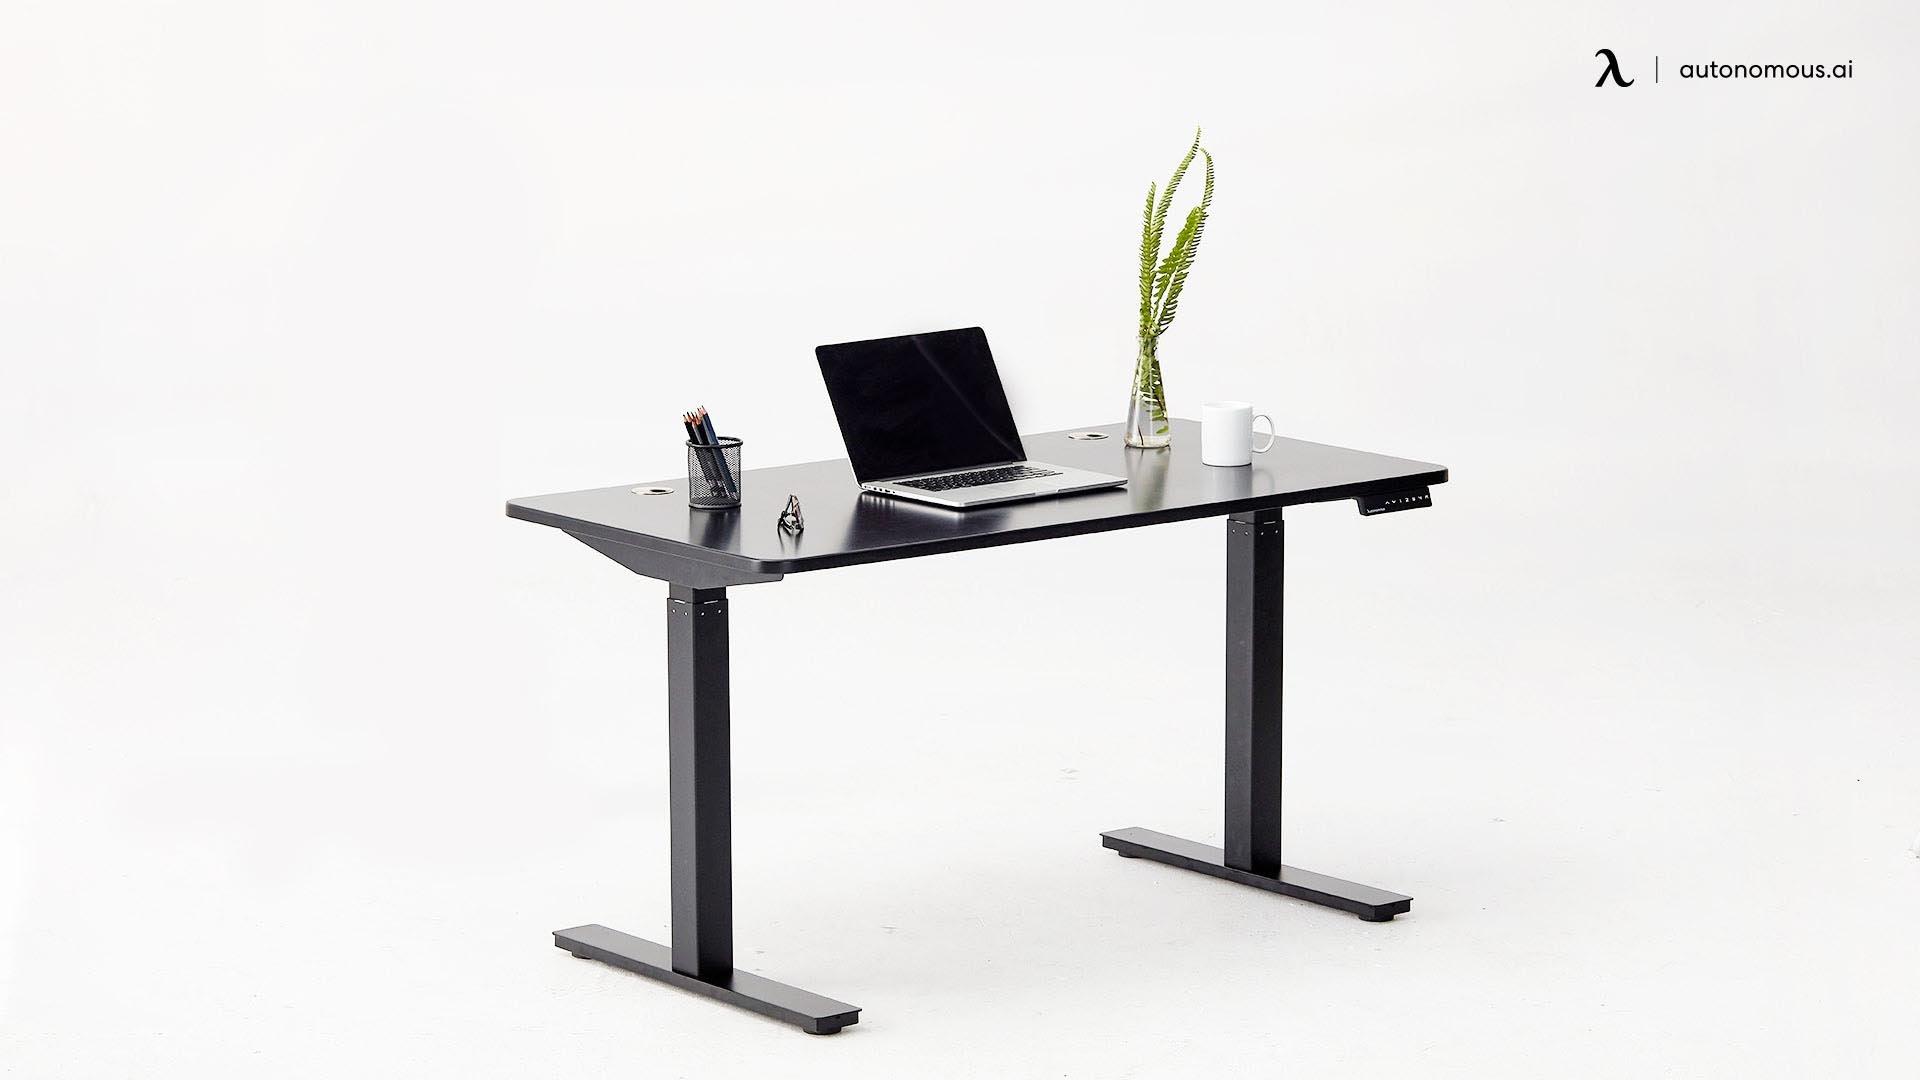 Autonomous SmartDesk 2 Electric Standing Desk